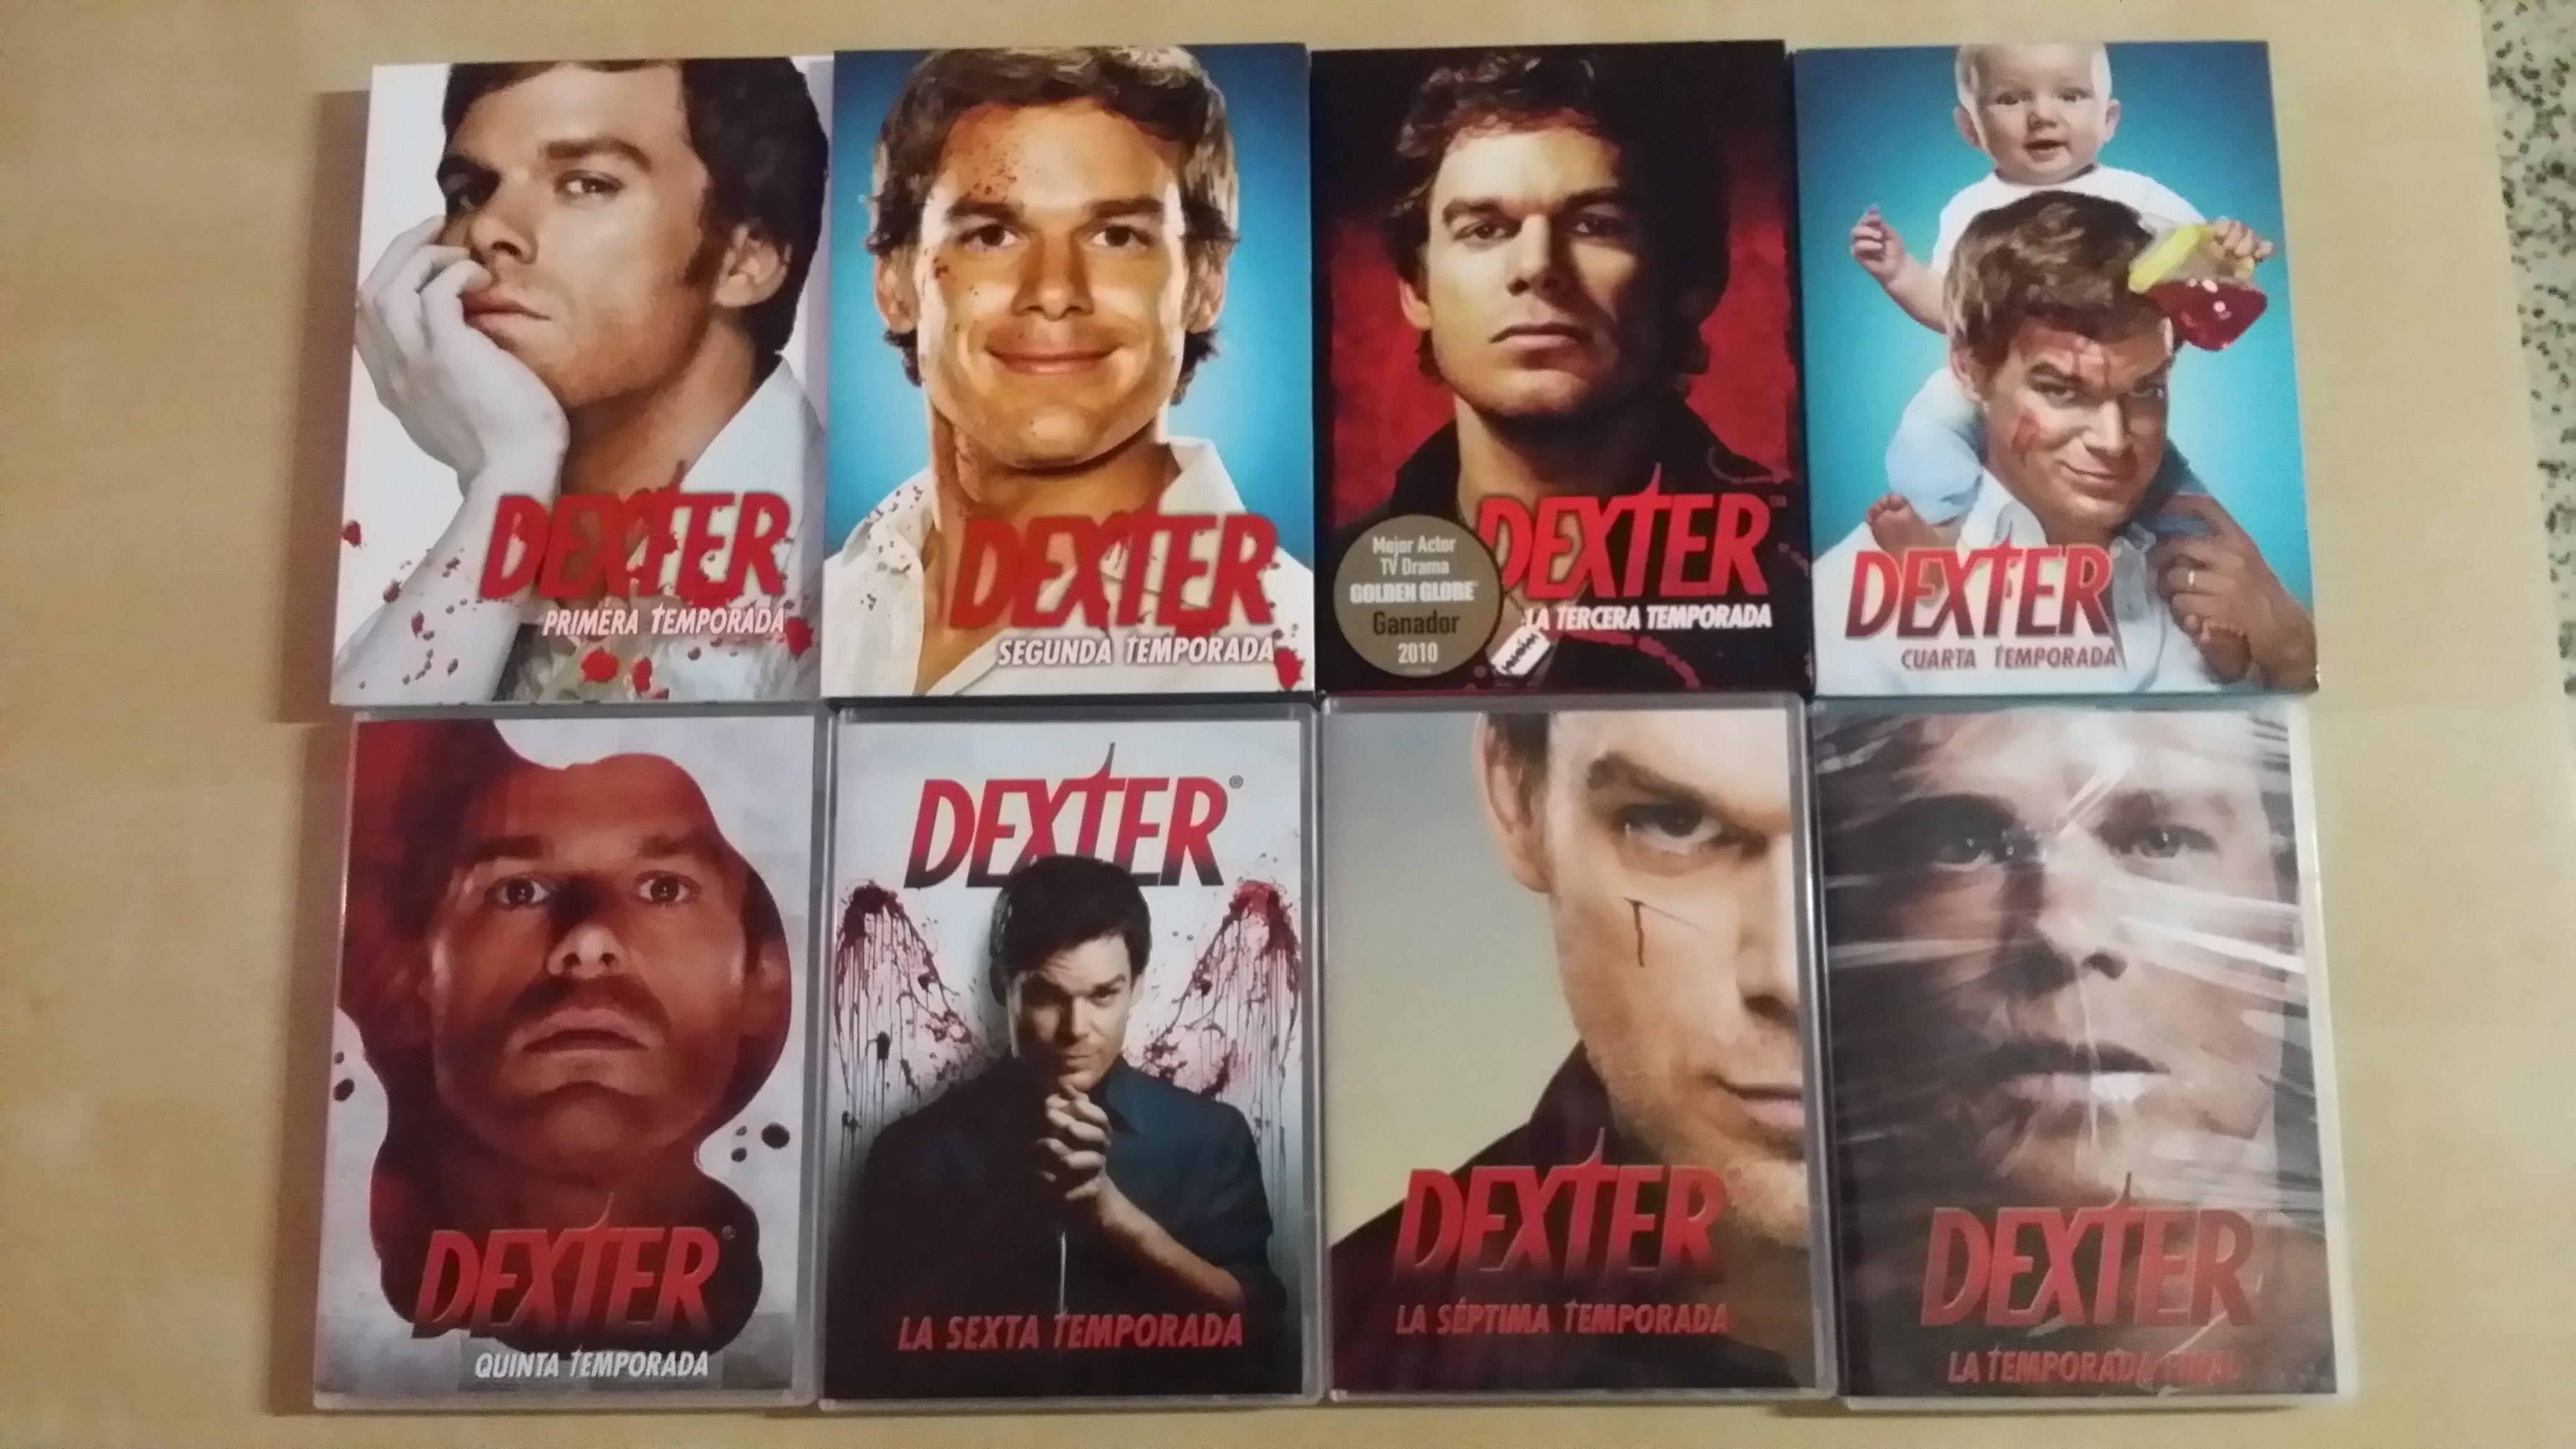 Dexter-Serie completa DVD | Lista de desejos | Pinterest | Dexter